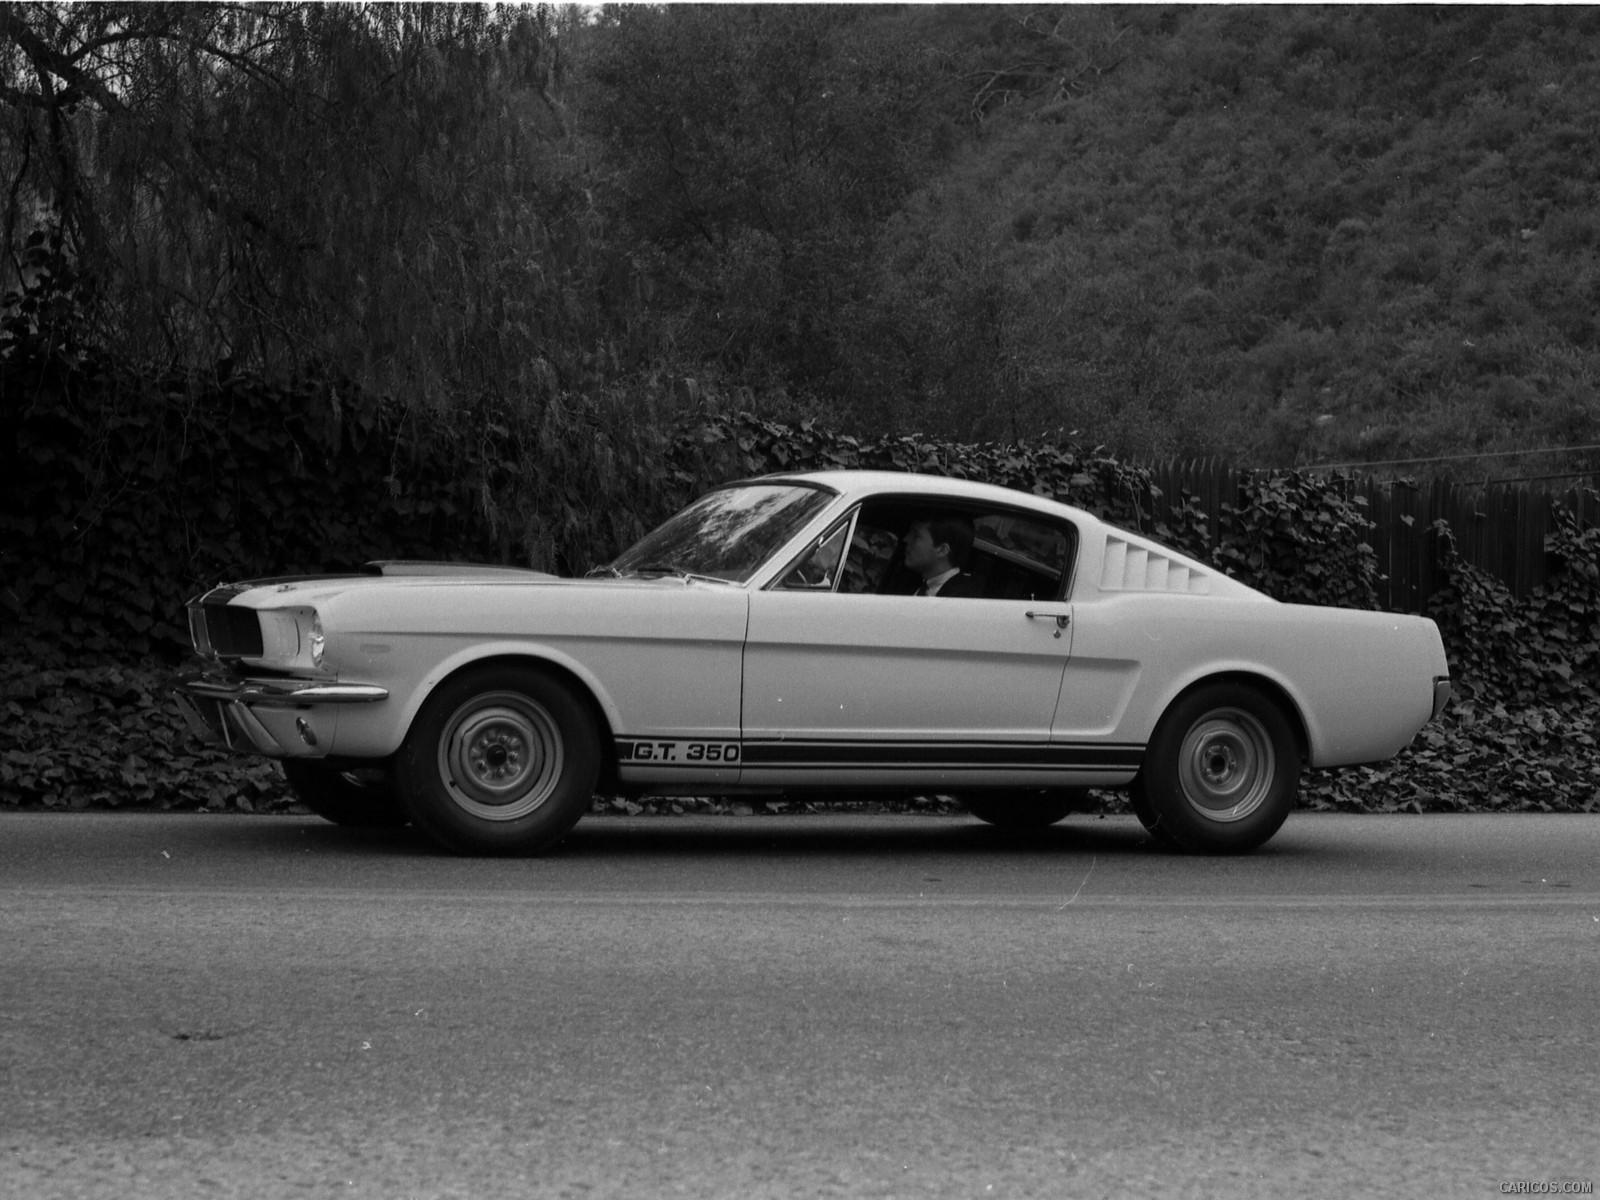 Ford Mustang Shelby GT350 hd duvarkağıdı